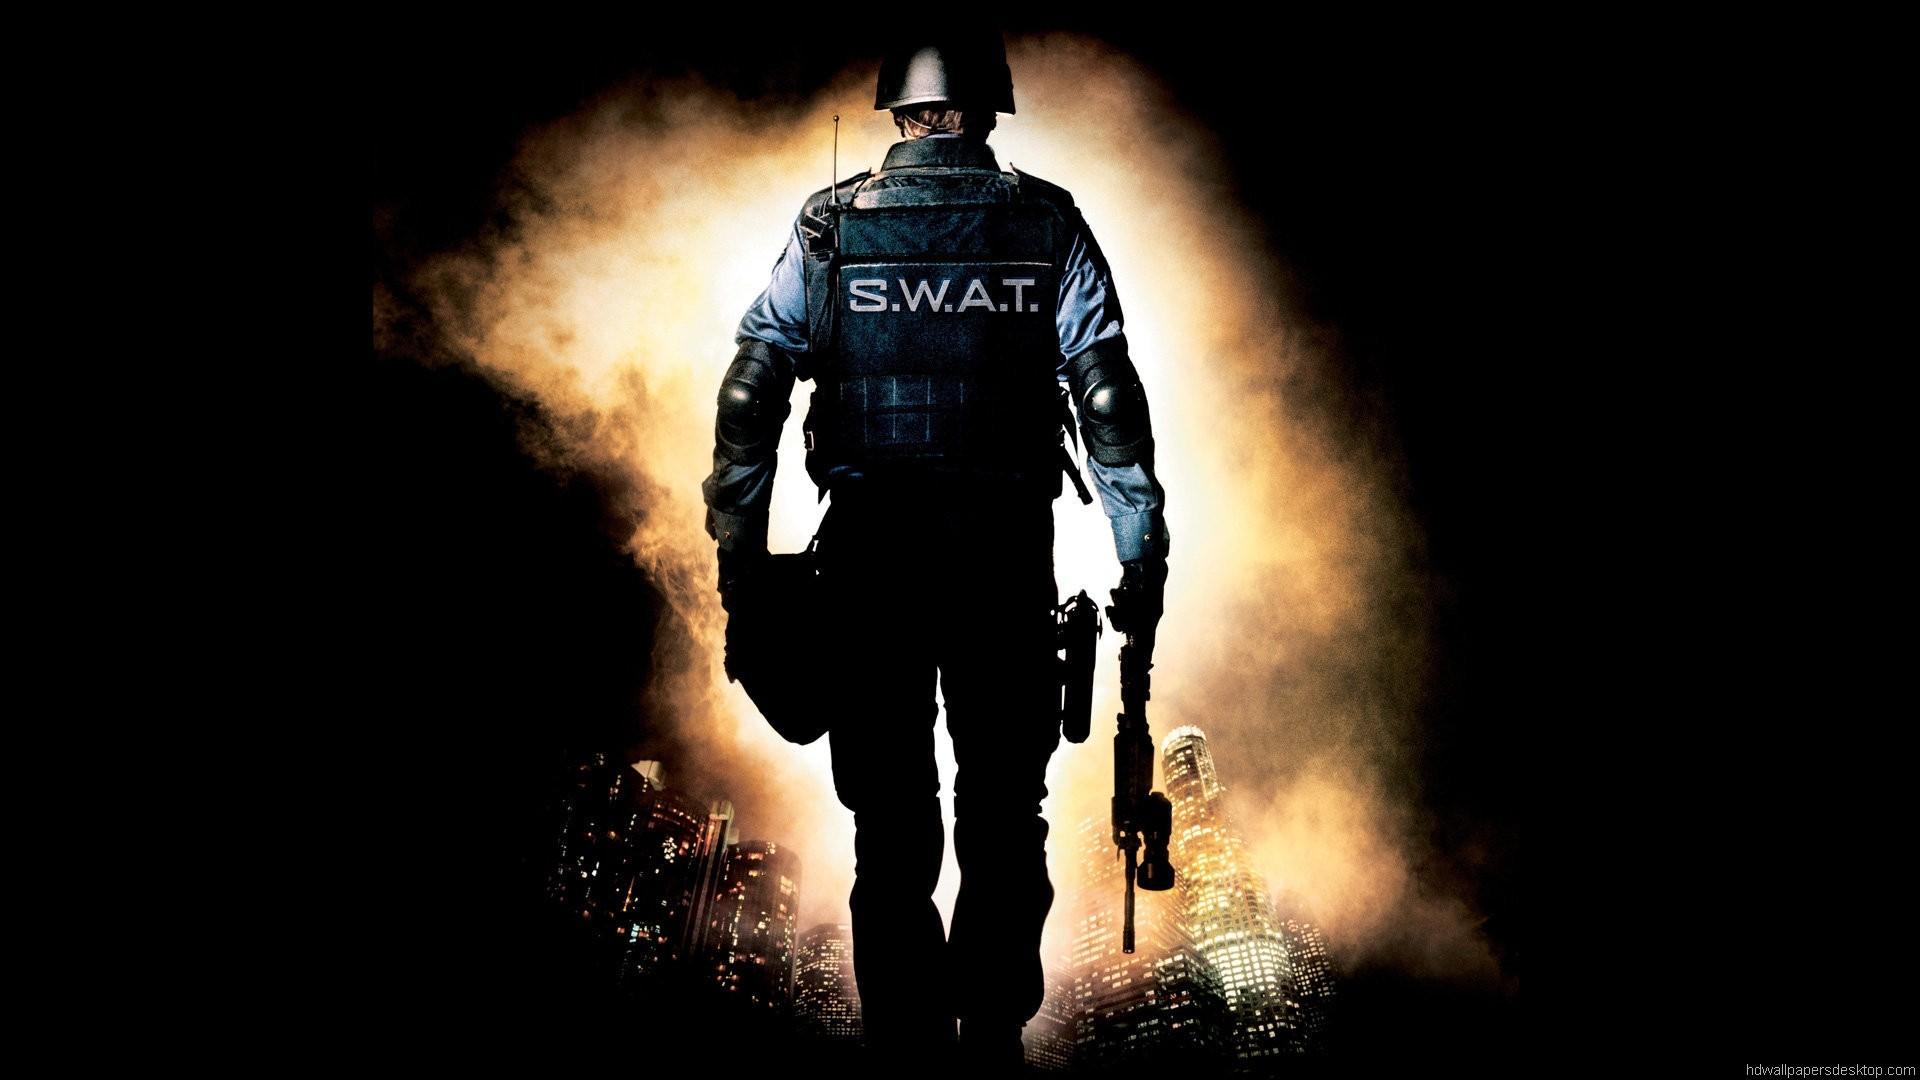 Res: 1920x1080, Swat Team Wallpaper